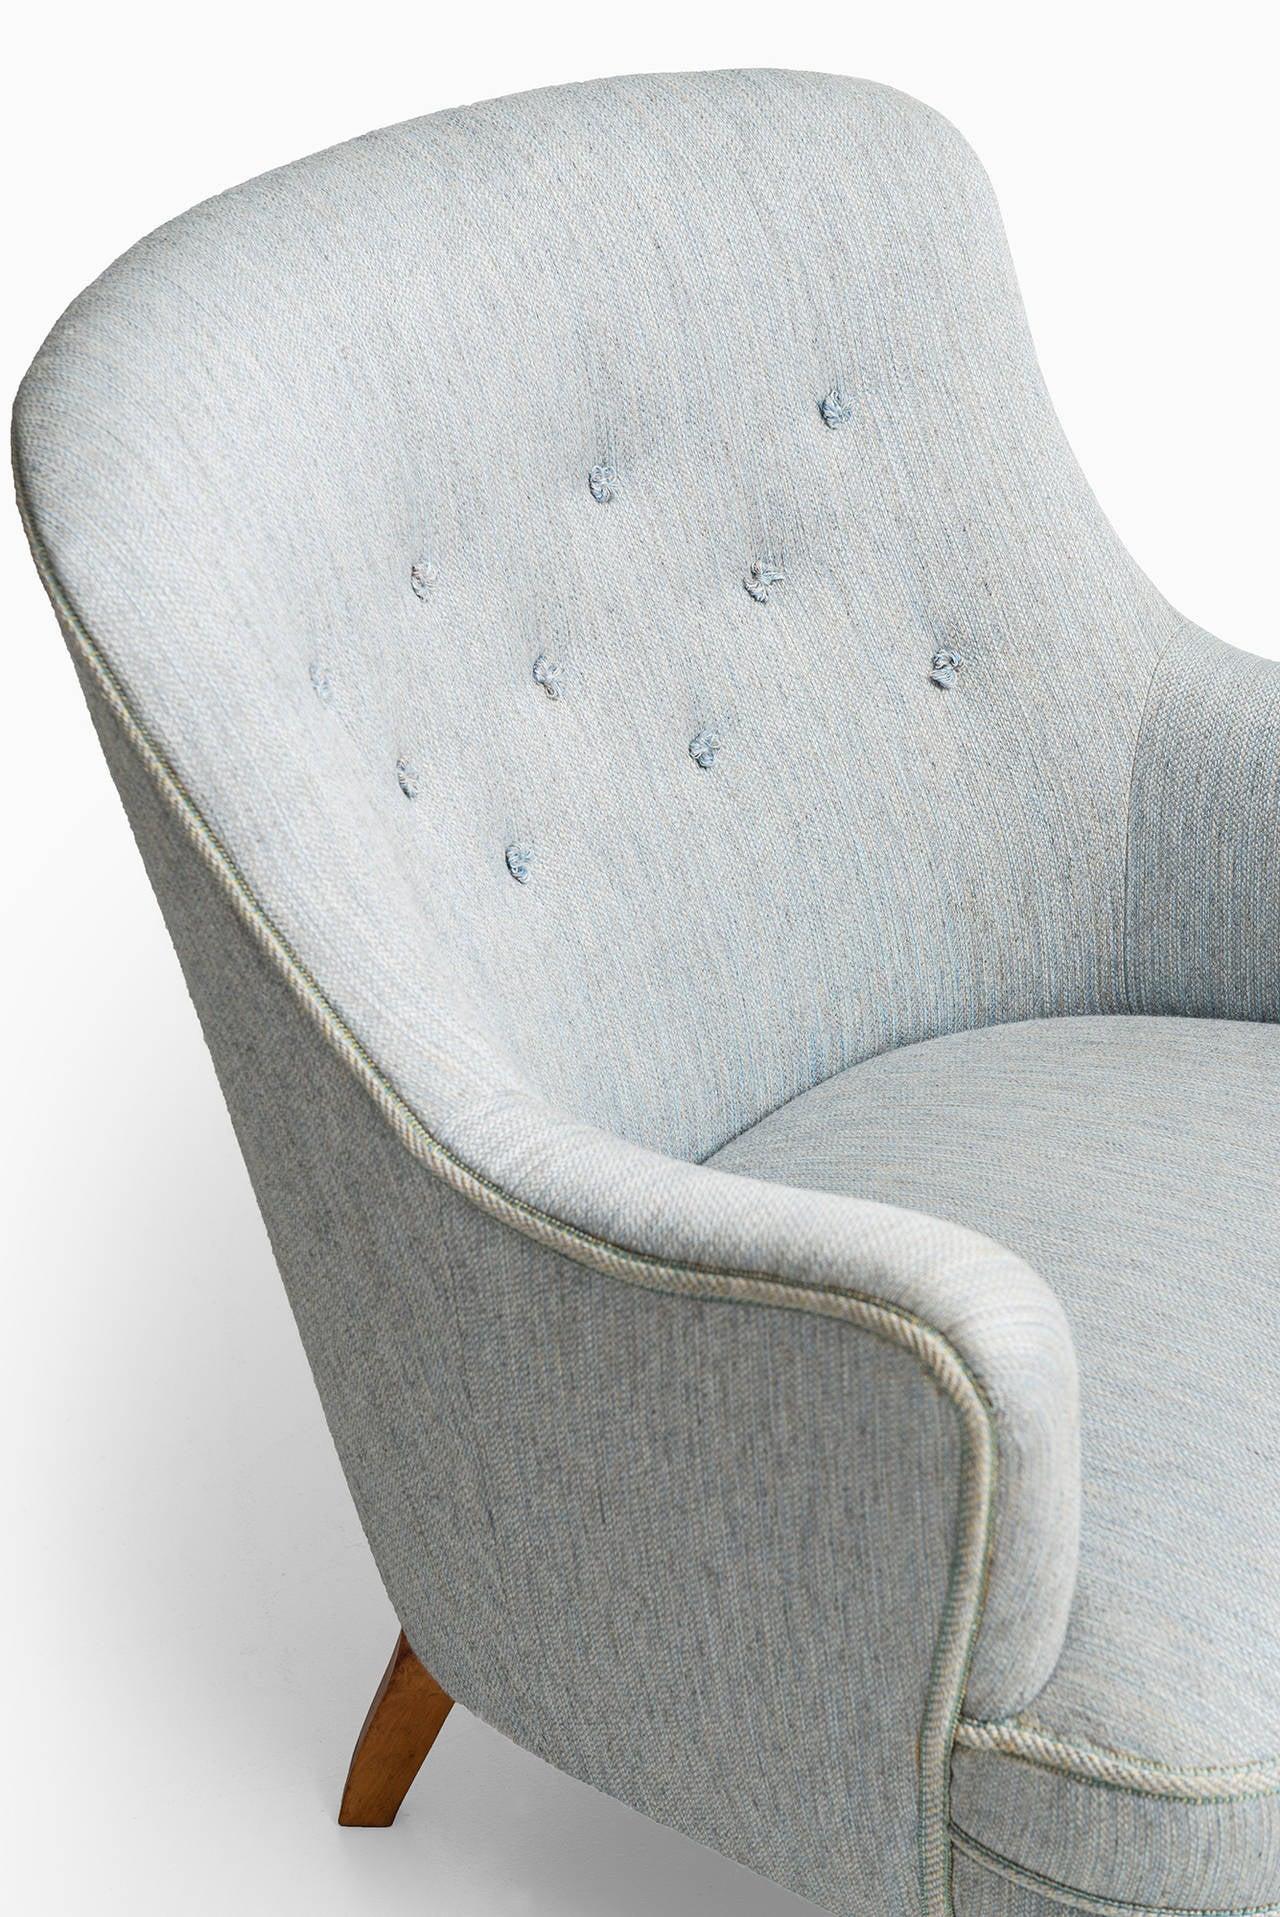 Mid-20th Century Carl Malmsten Easy Chair by O.H Sjögren in Sweden For Sale